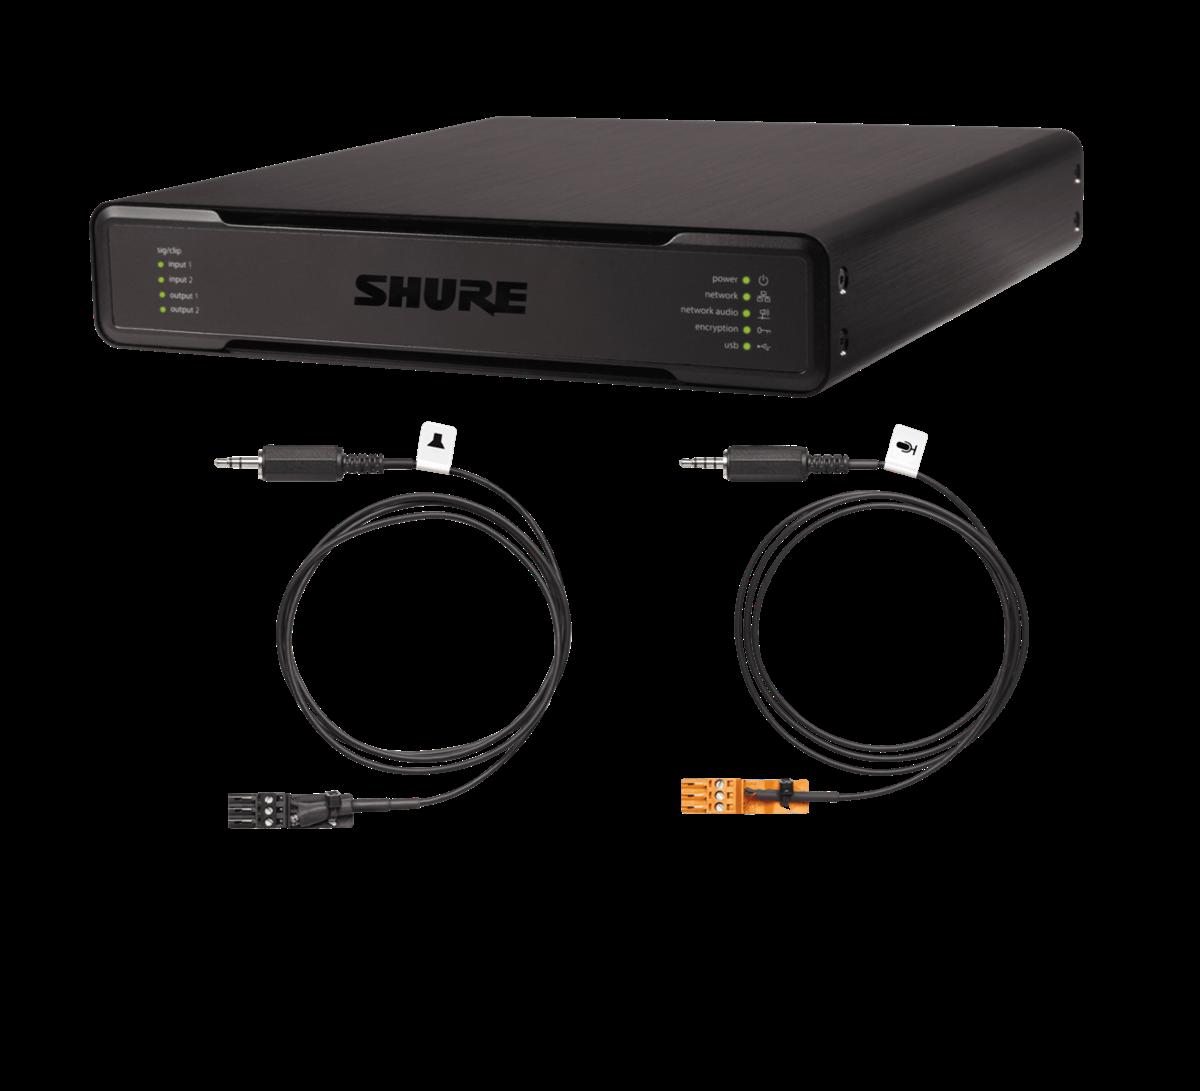 Shure P300 Audio Conferencing Processor incl VCC3